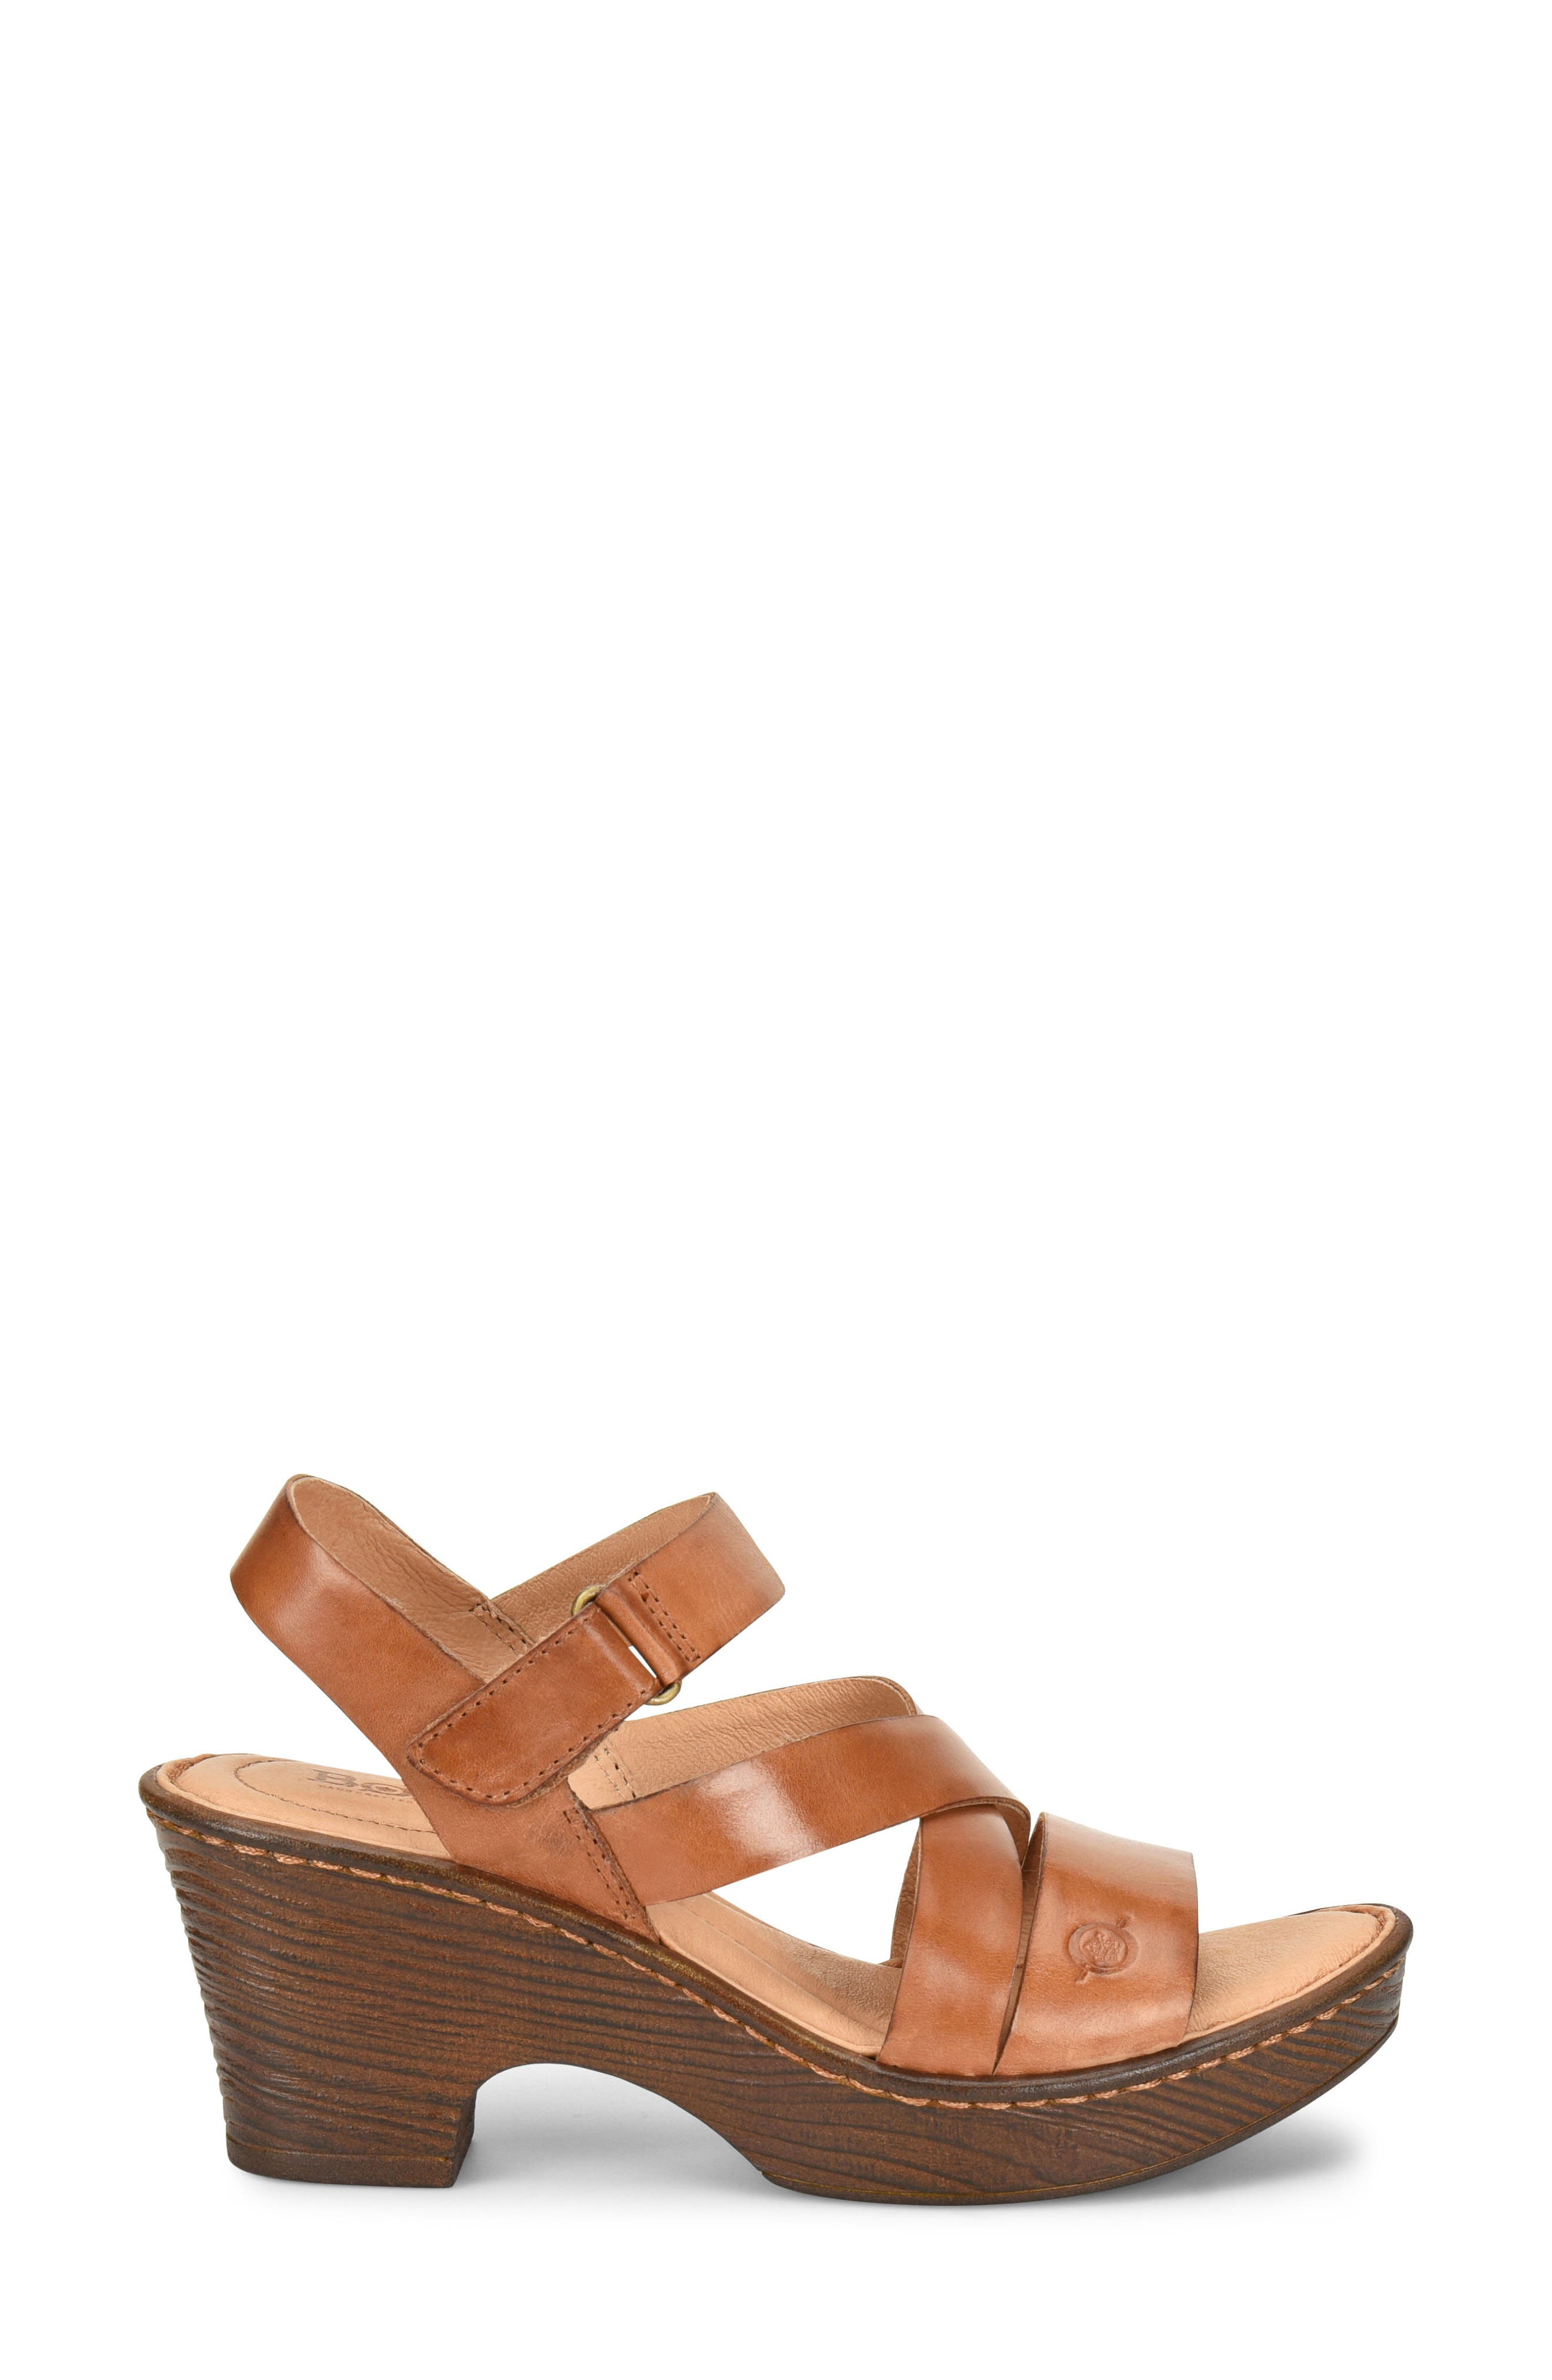 Cubera Platform Sandal,                             Alternate thumbnail 3, color,                             Brown Leather